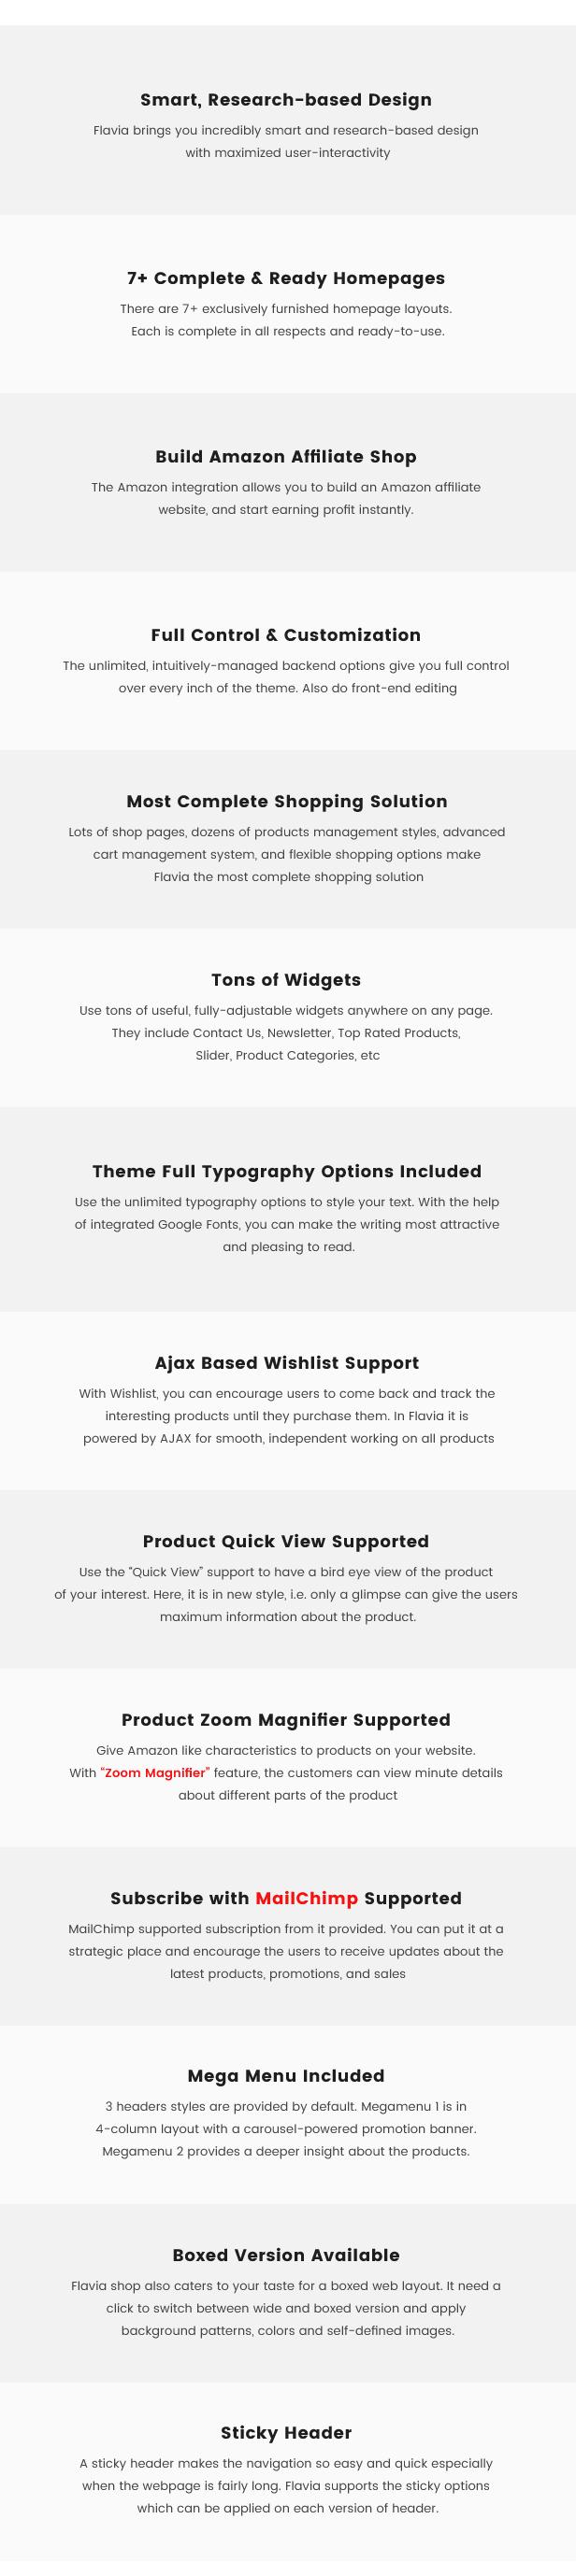 Flavia - Download Responsive WooCommerce WordPress Theme 2020 - 12